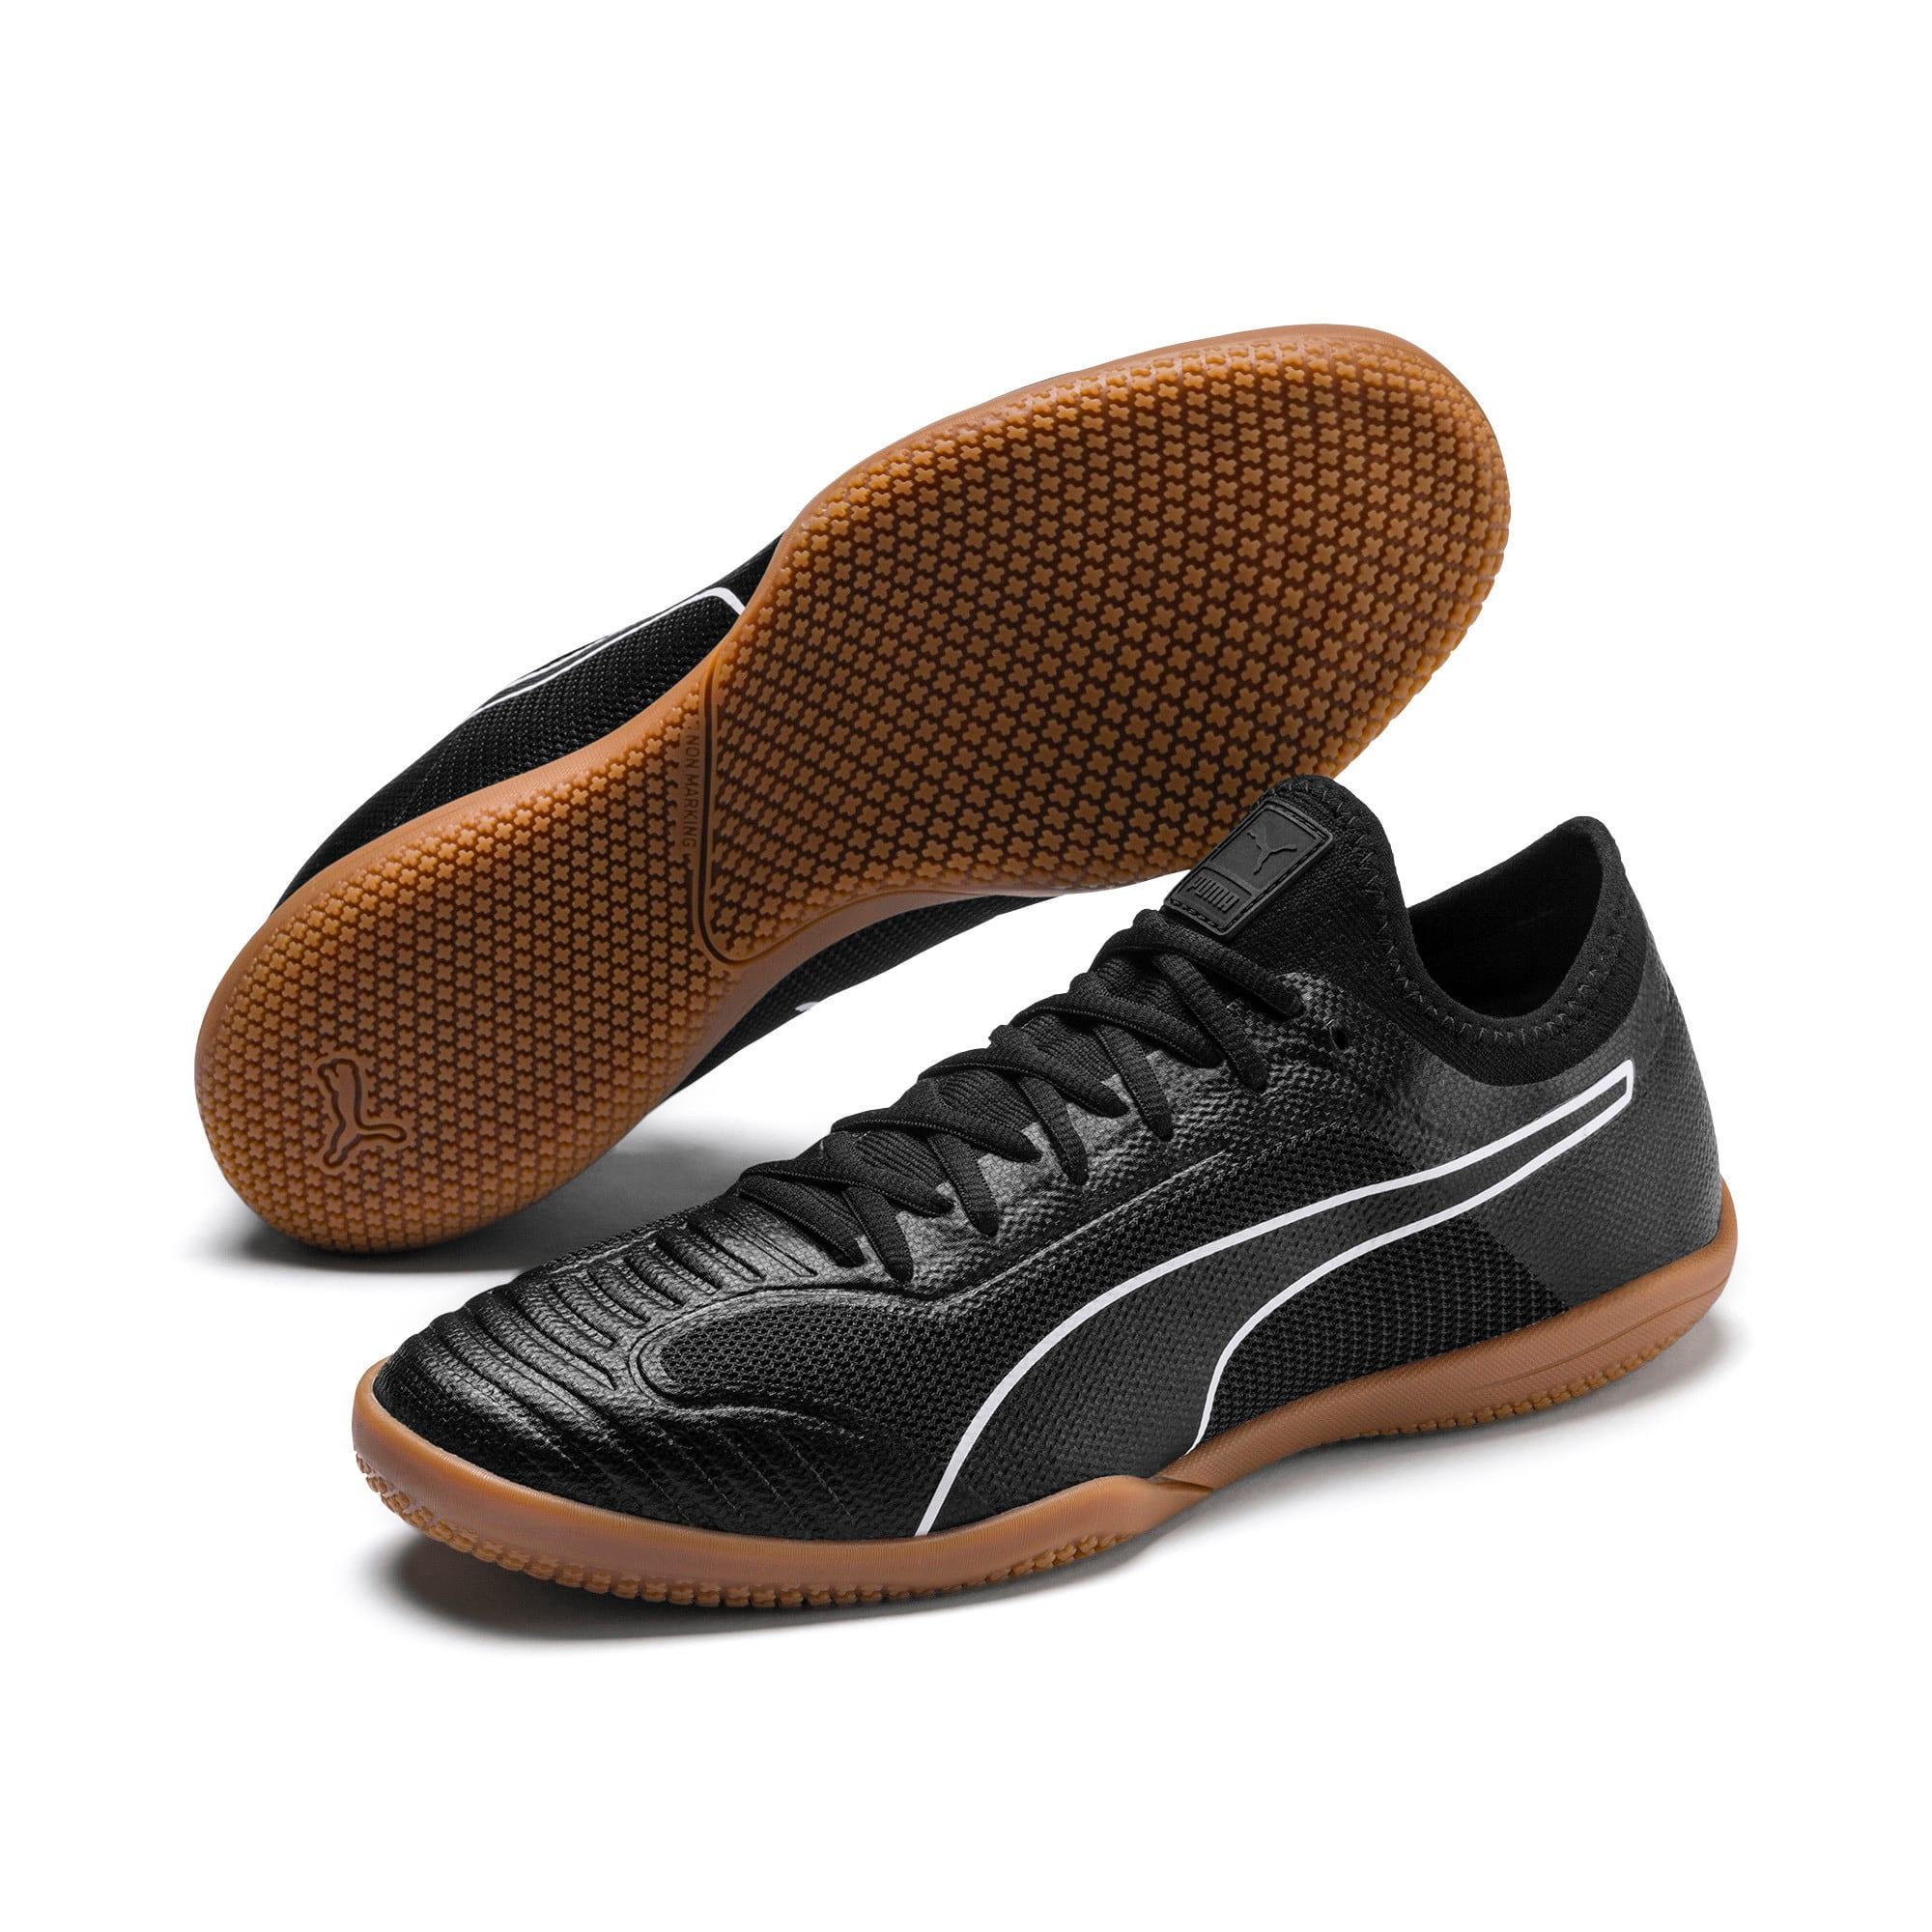 Thumbnail 3 of 365 Sala 1 Men's Soccer Shoes, Puma Black-Puma White-Gum, medium